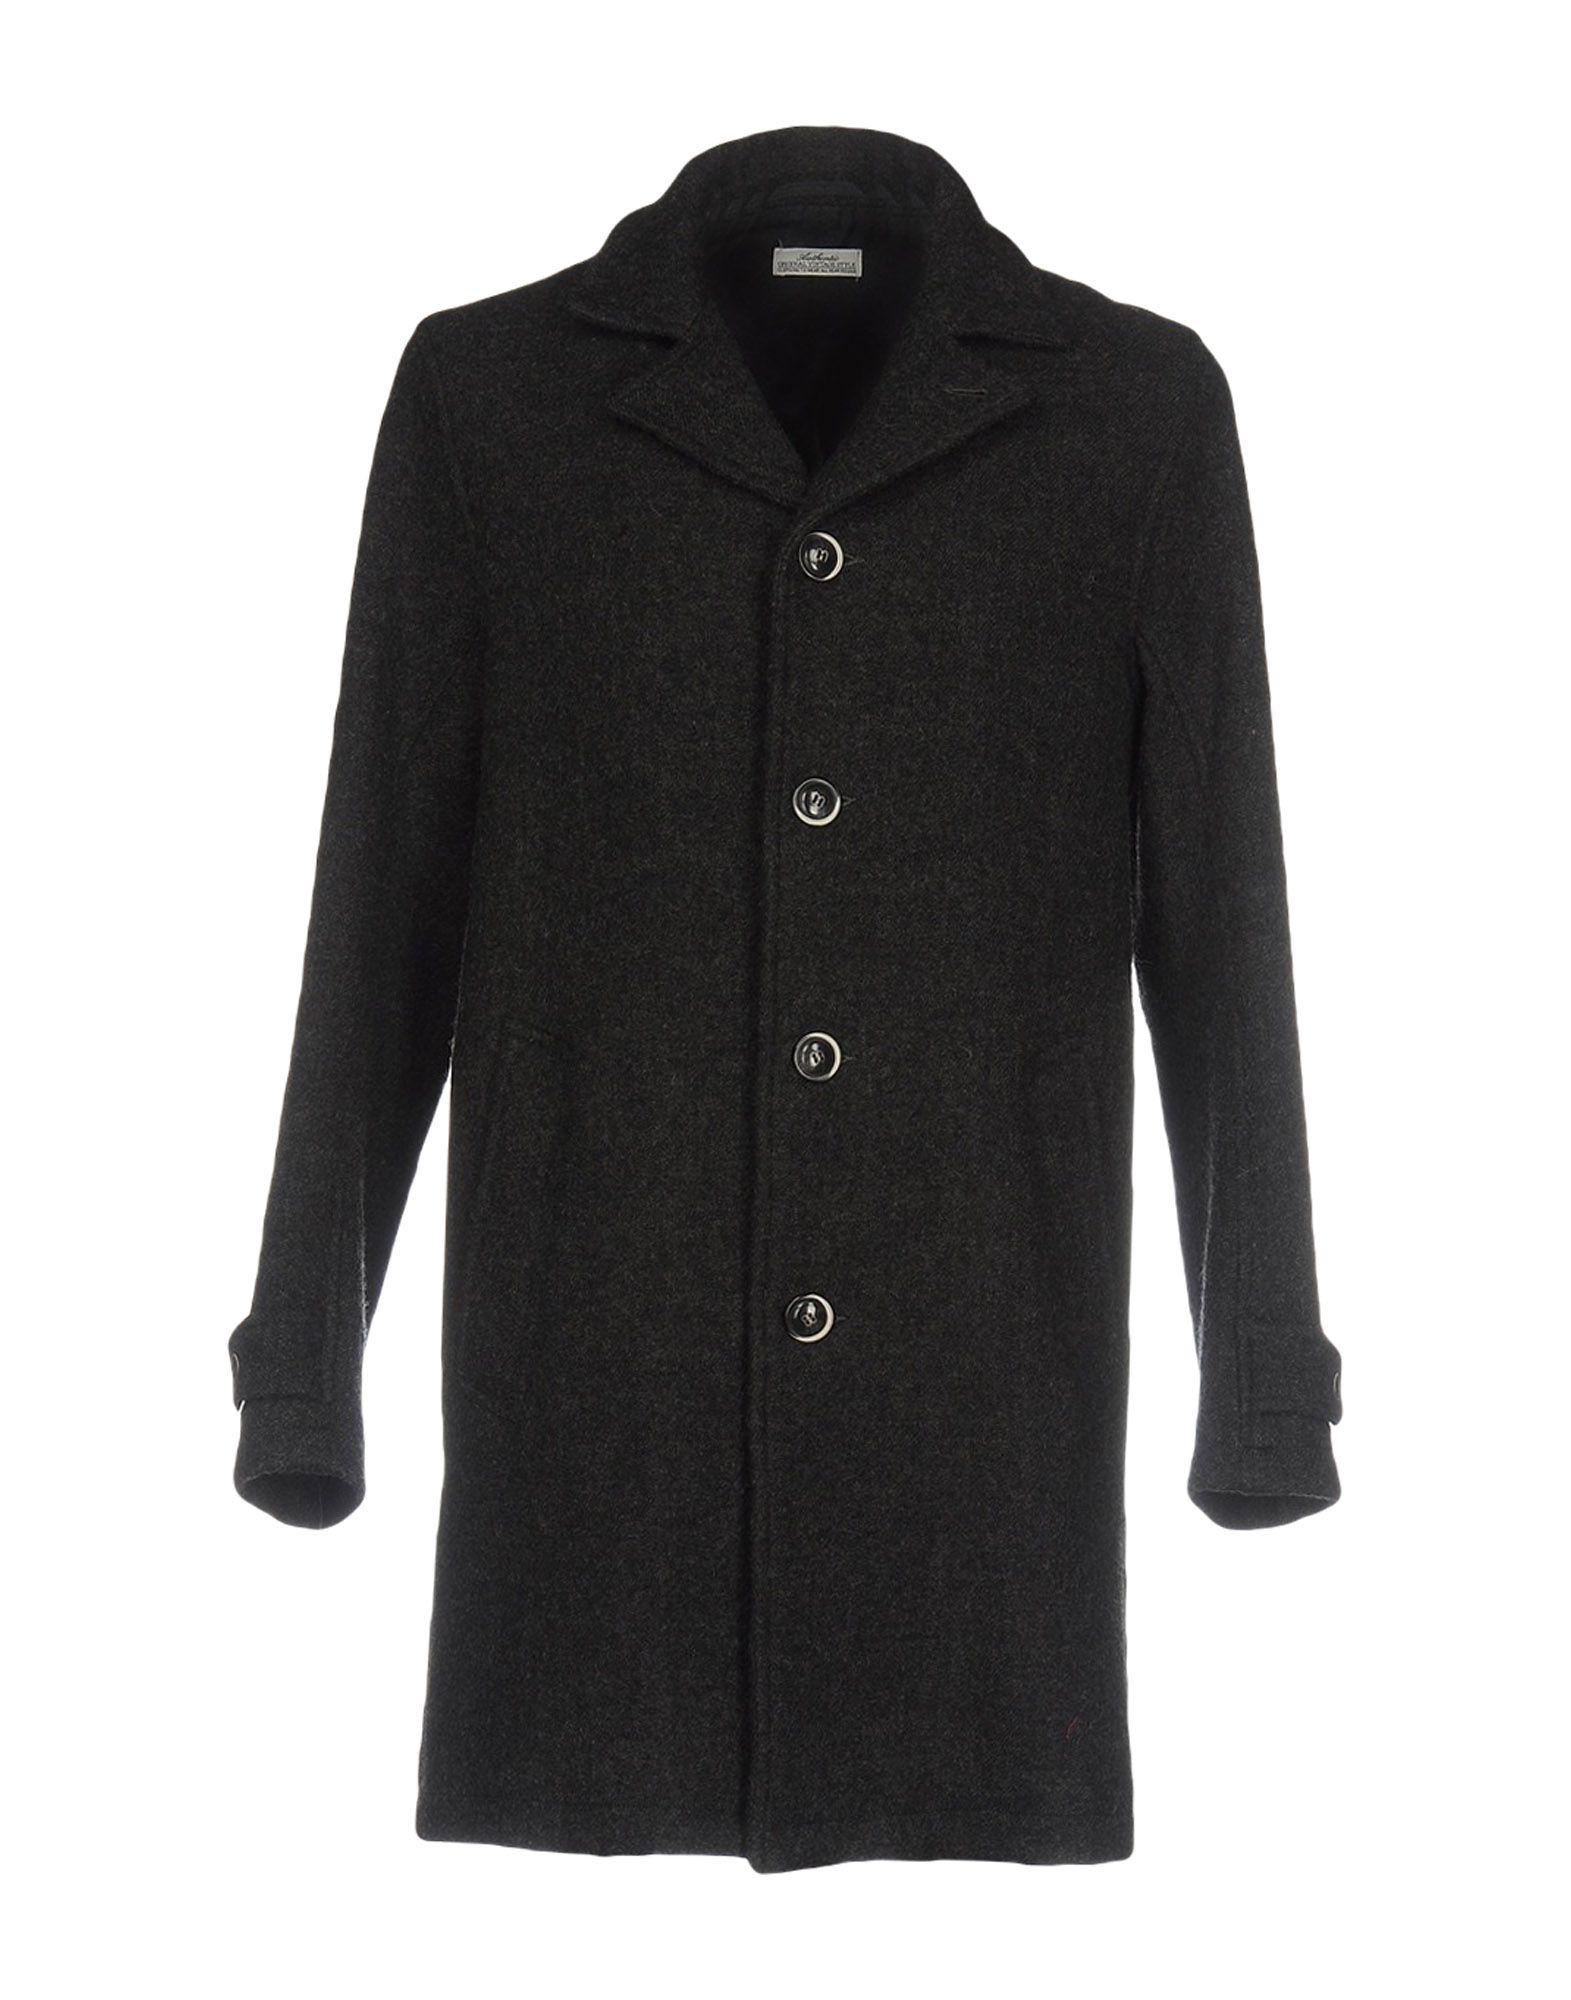 Authentic Original Vintage Style Coats In Steel Grey